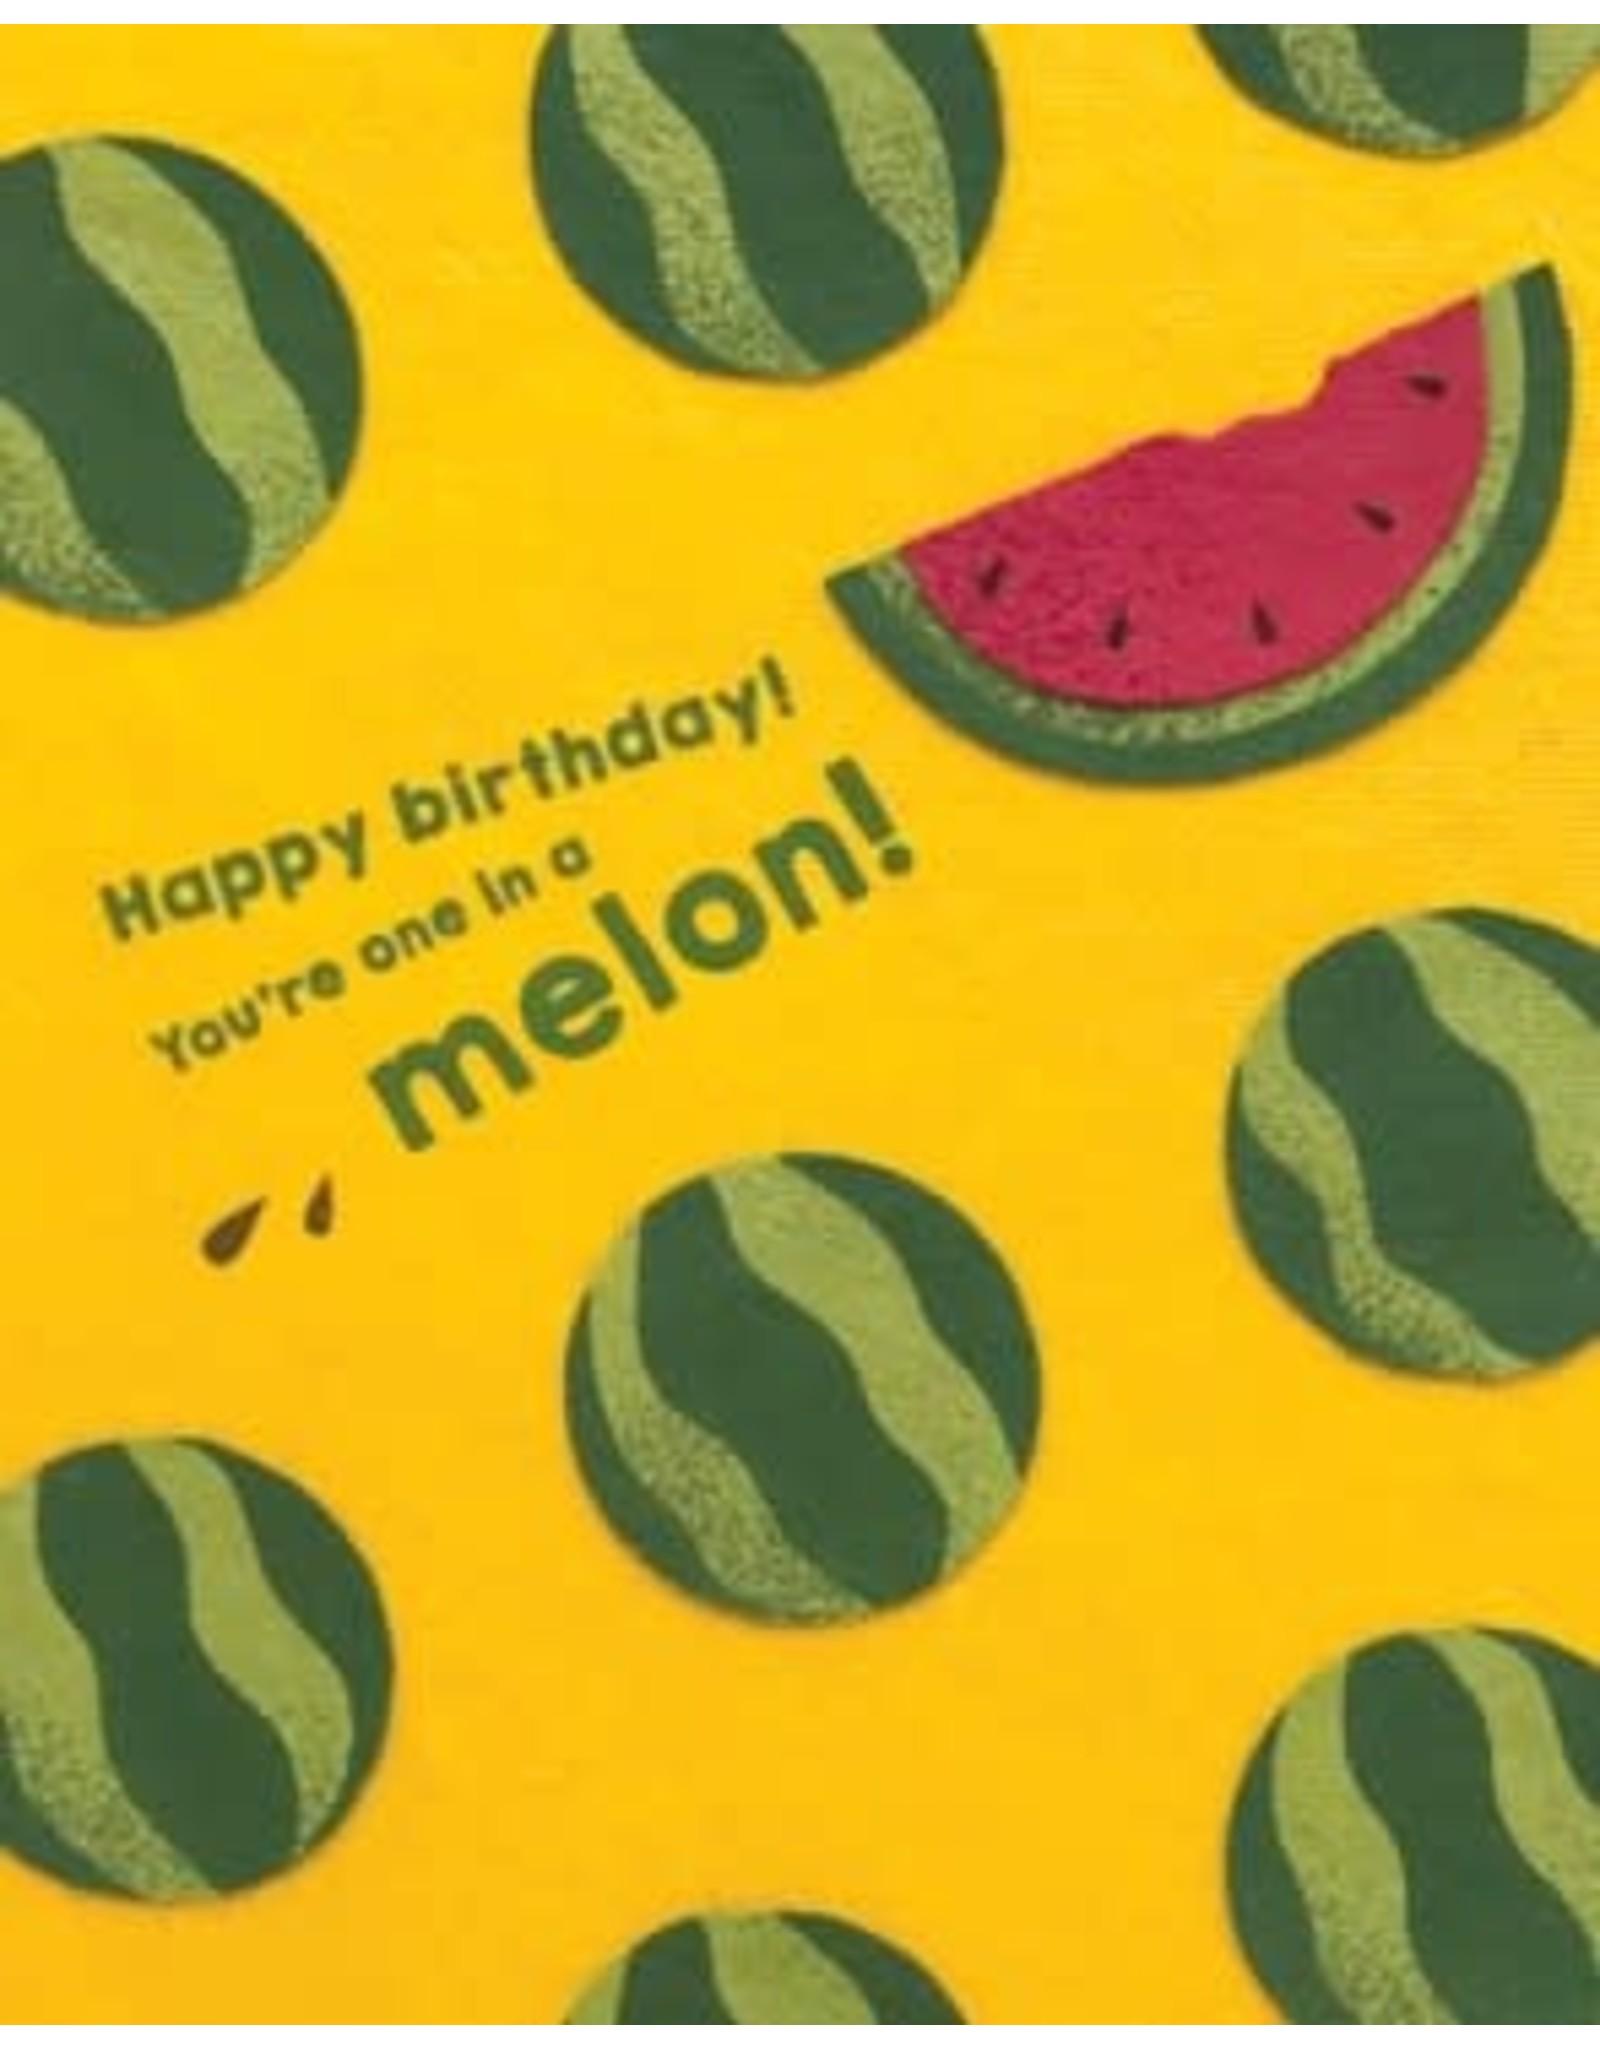 One Melon Birthday Greeting Card, Philippines